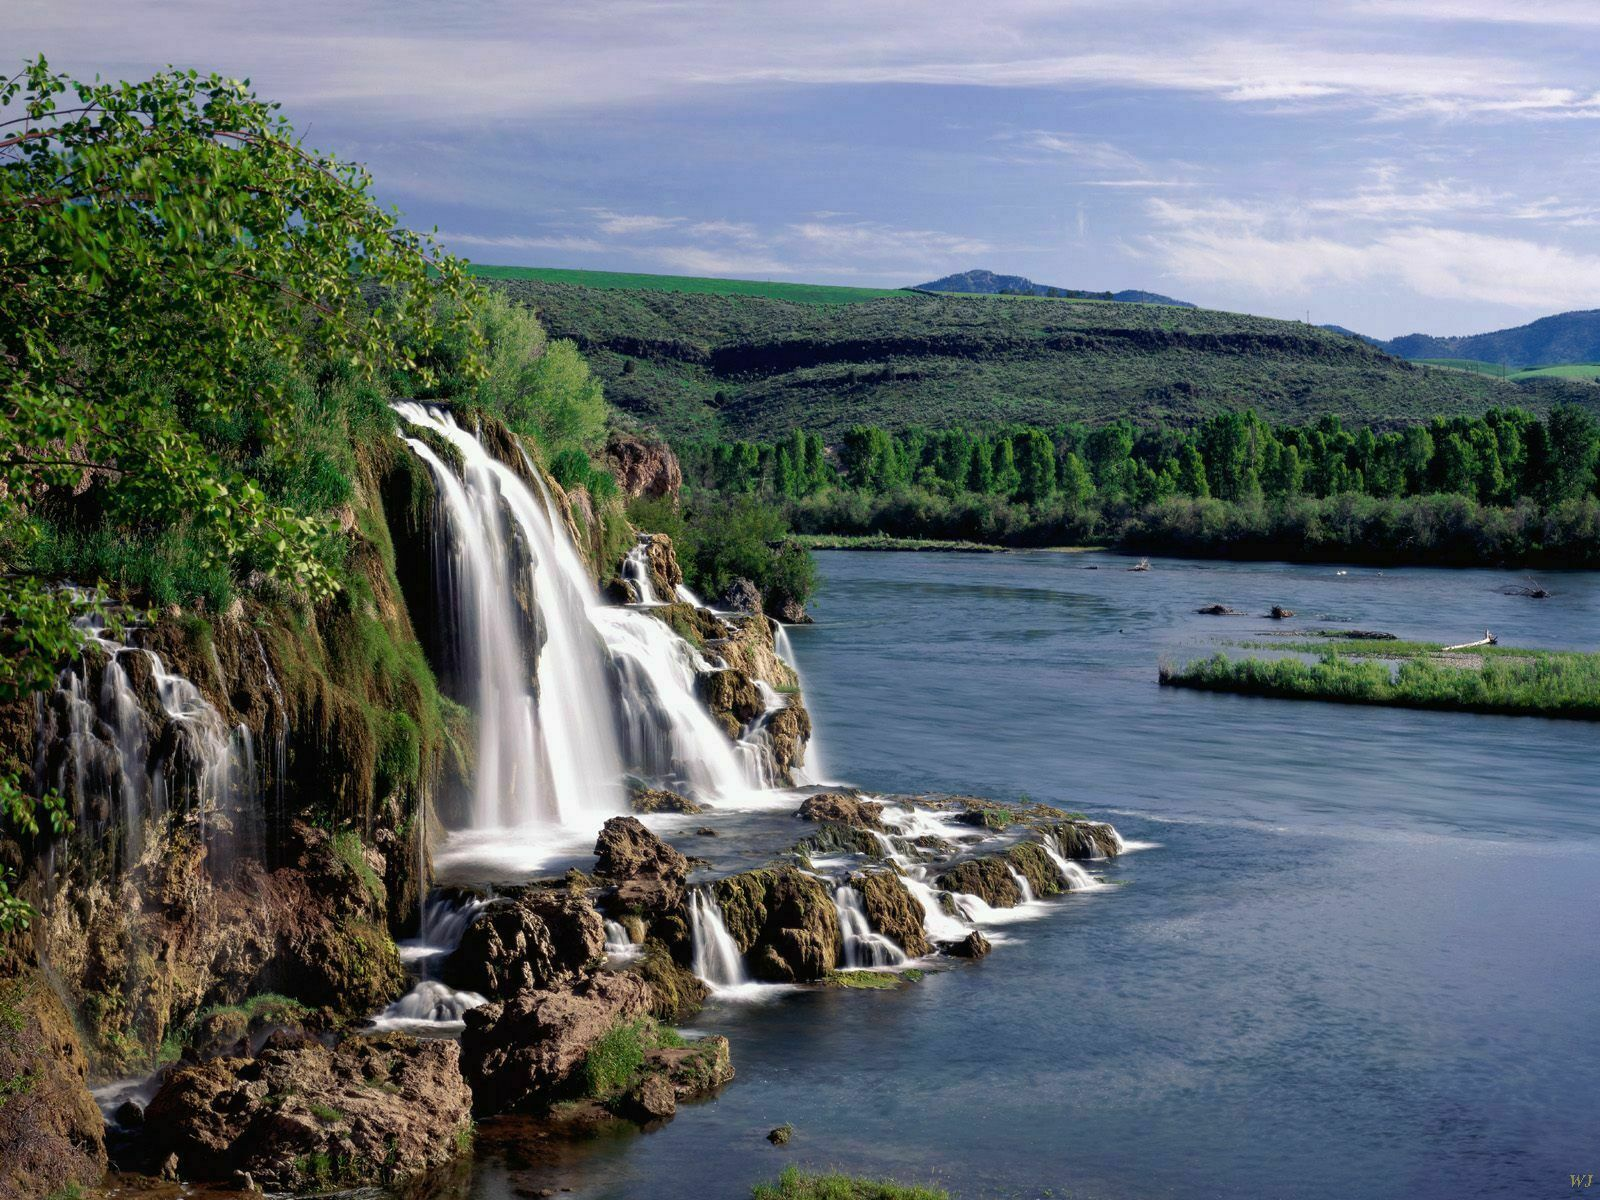 Pejzaži i prirodne lepote Zemlje Landscape-fall-creek-falls-and-snake-river-idaho